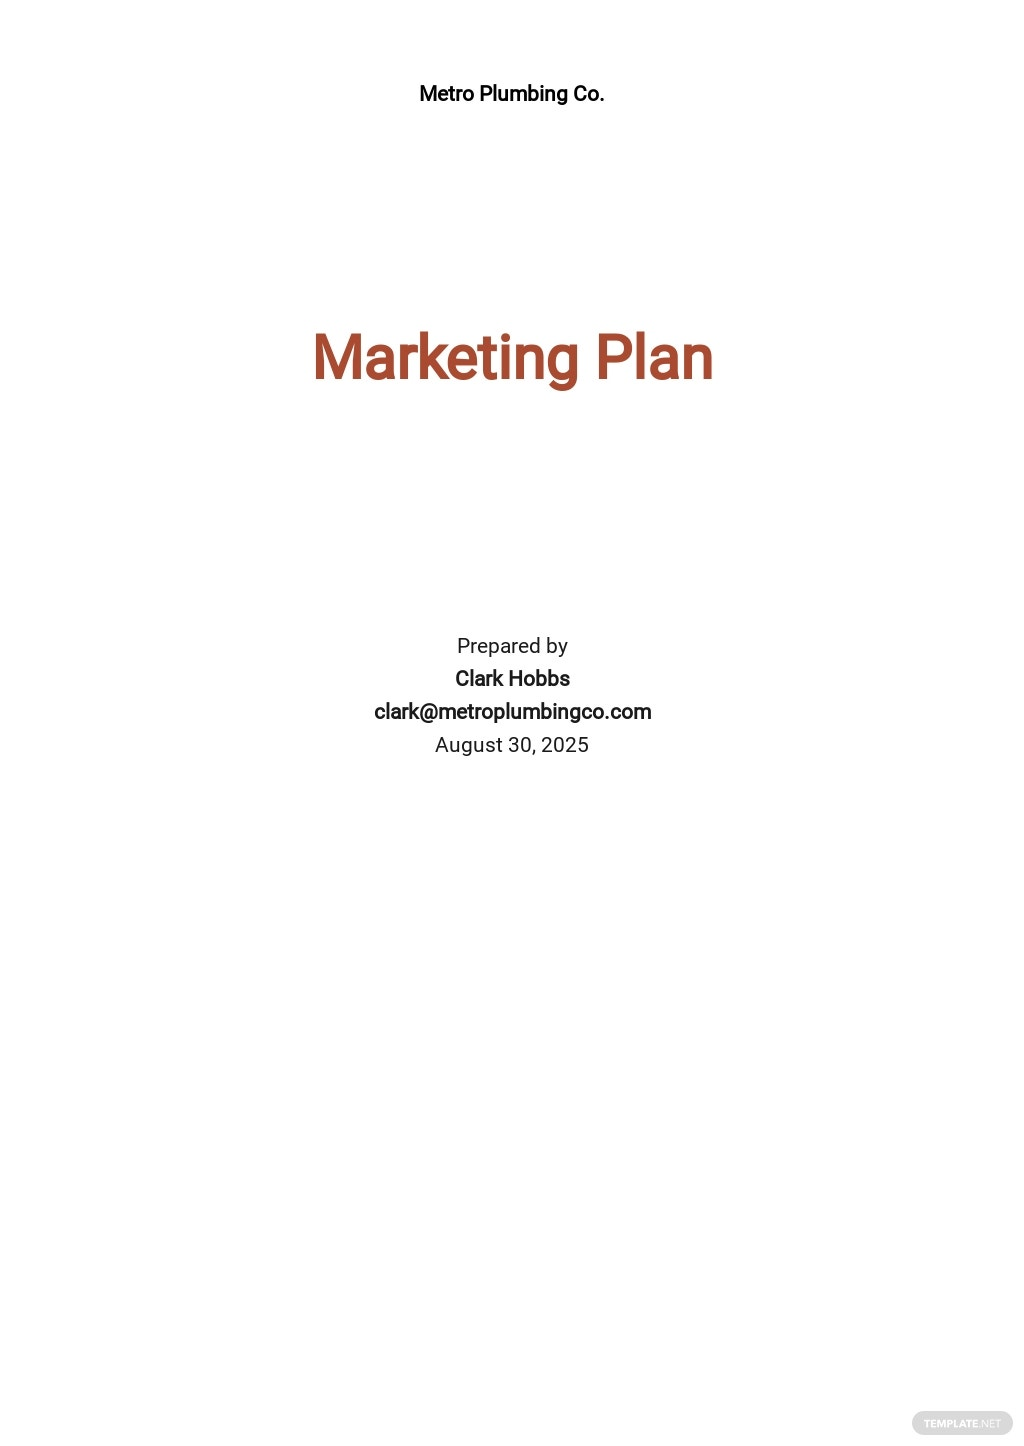 Plumbing Company Marketing Plan Template